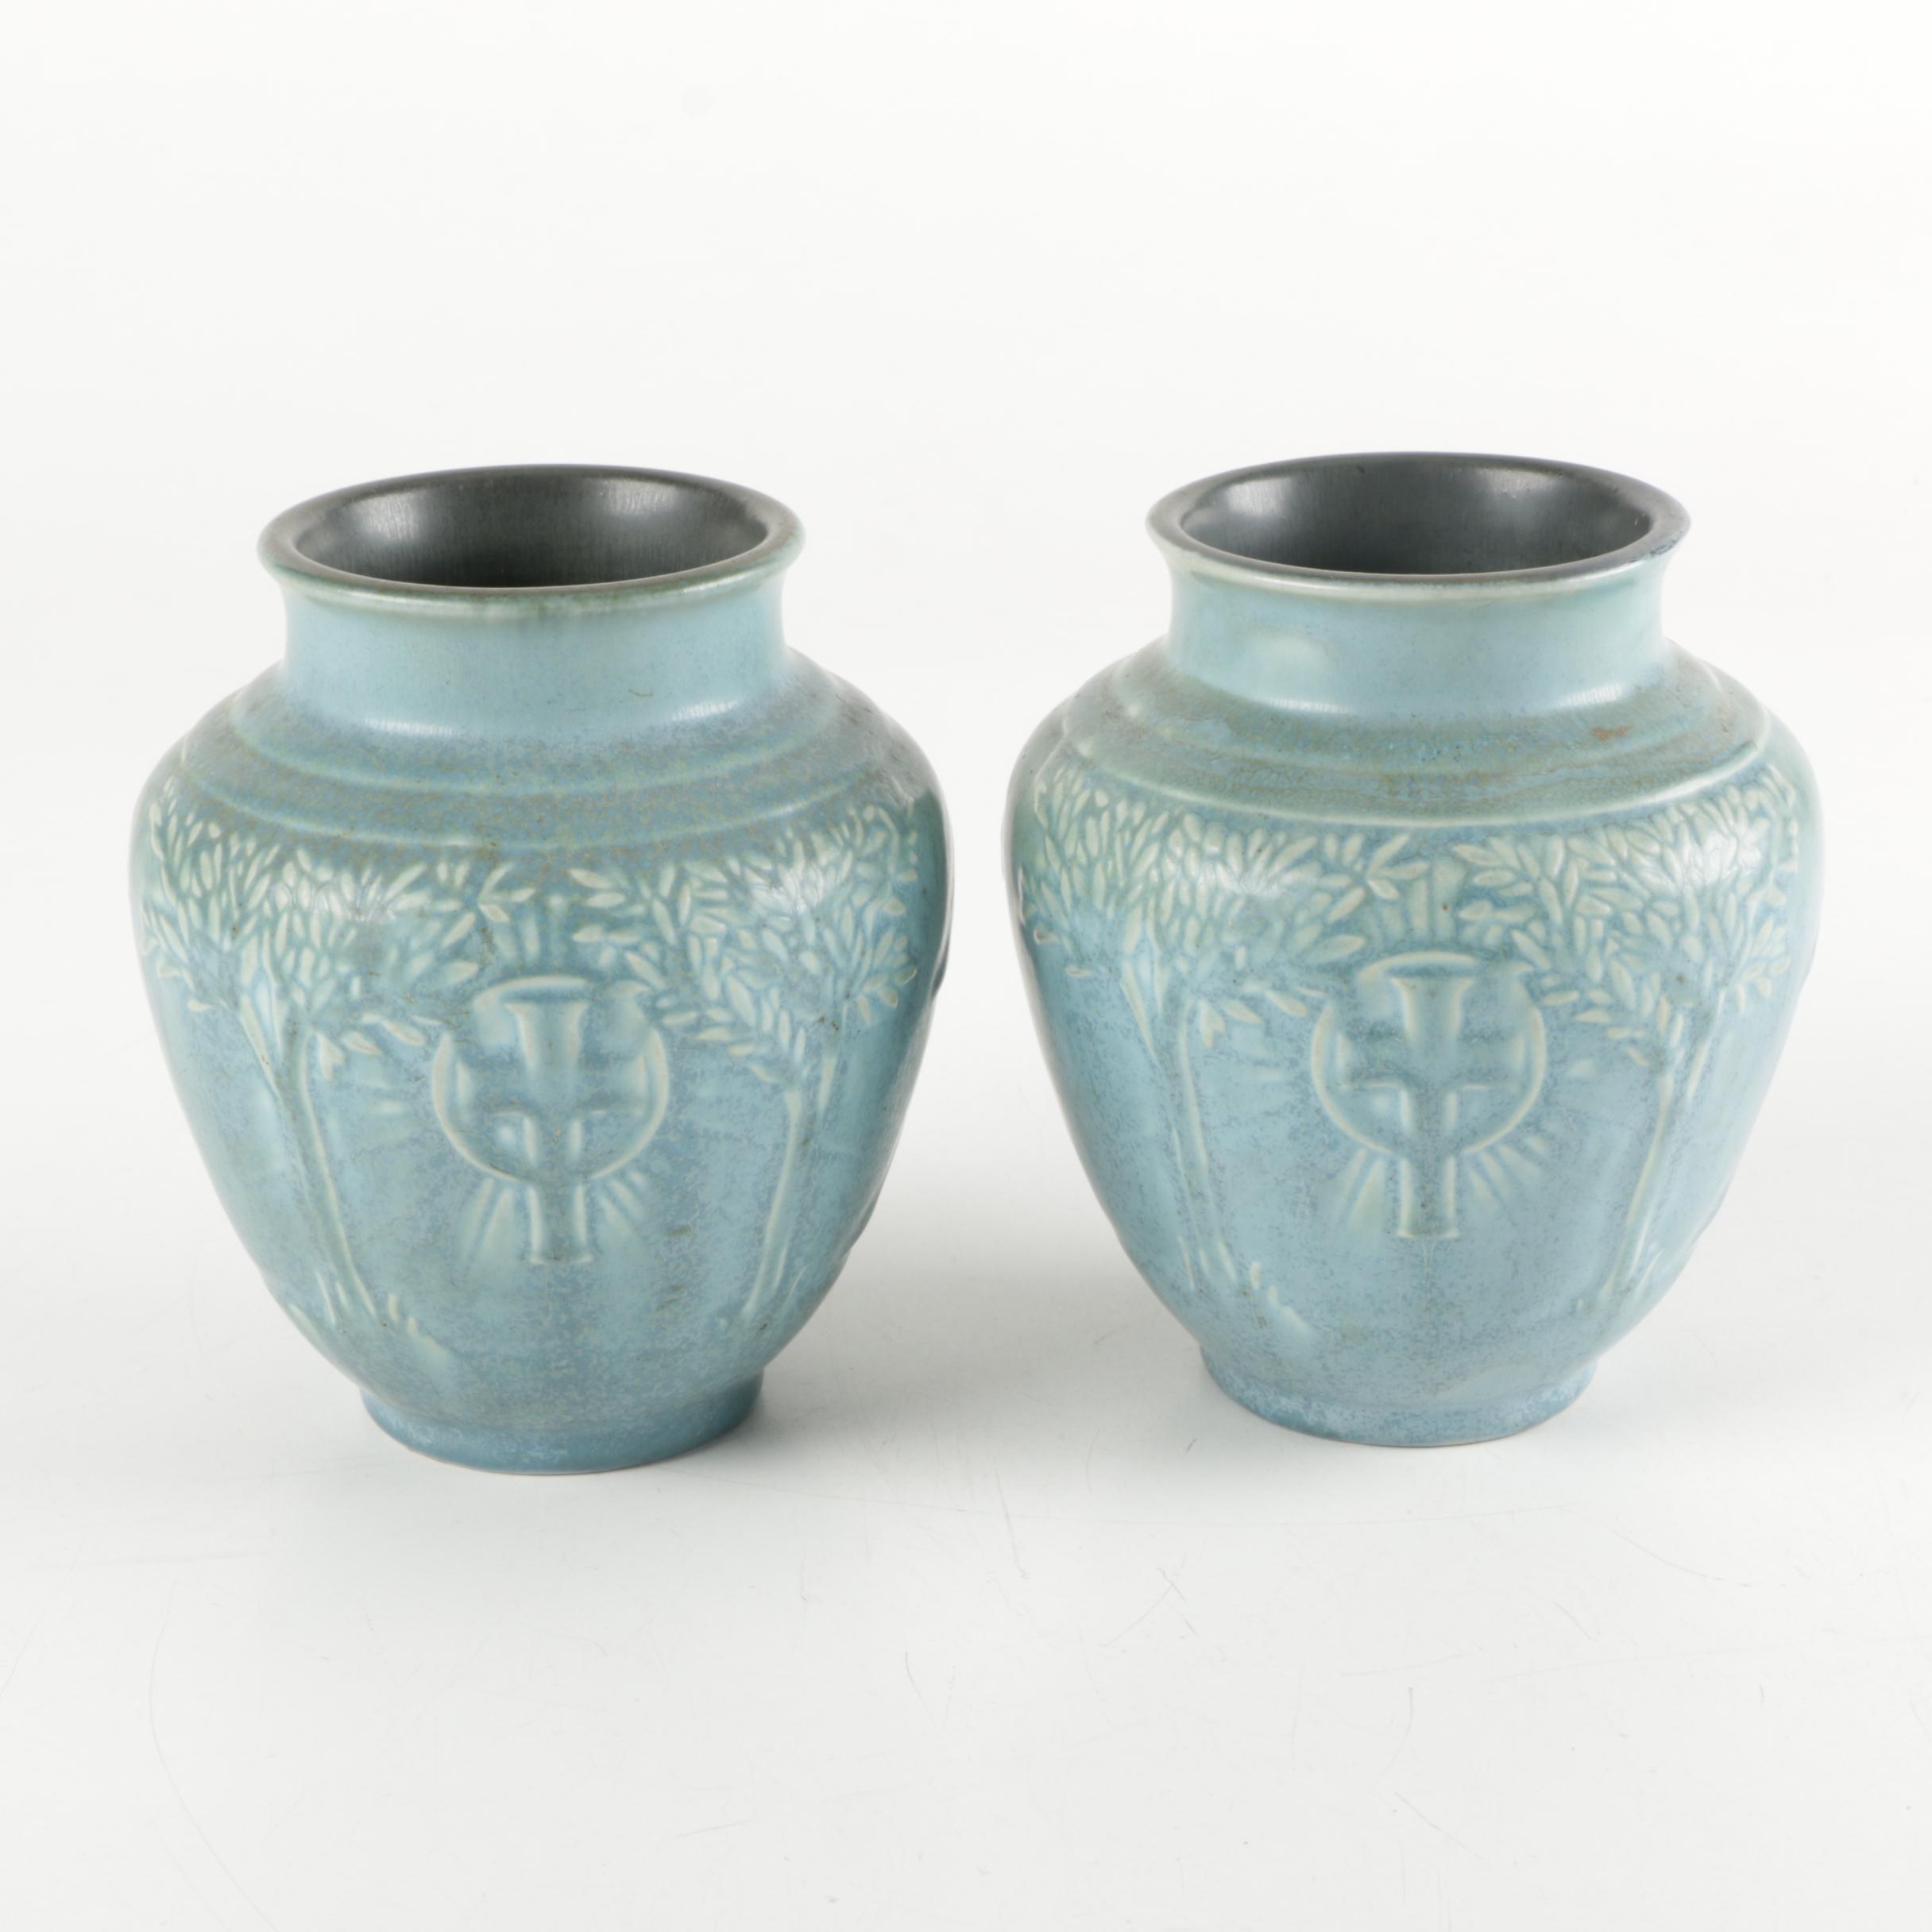 1934 Rookwood Pottery Commemorative Vases